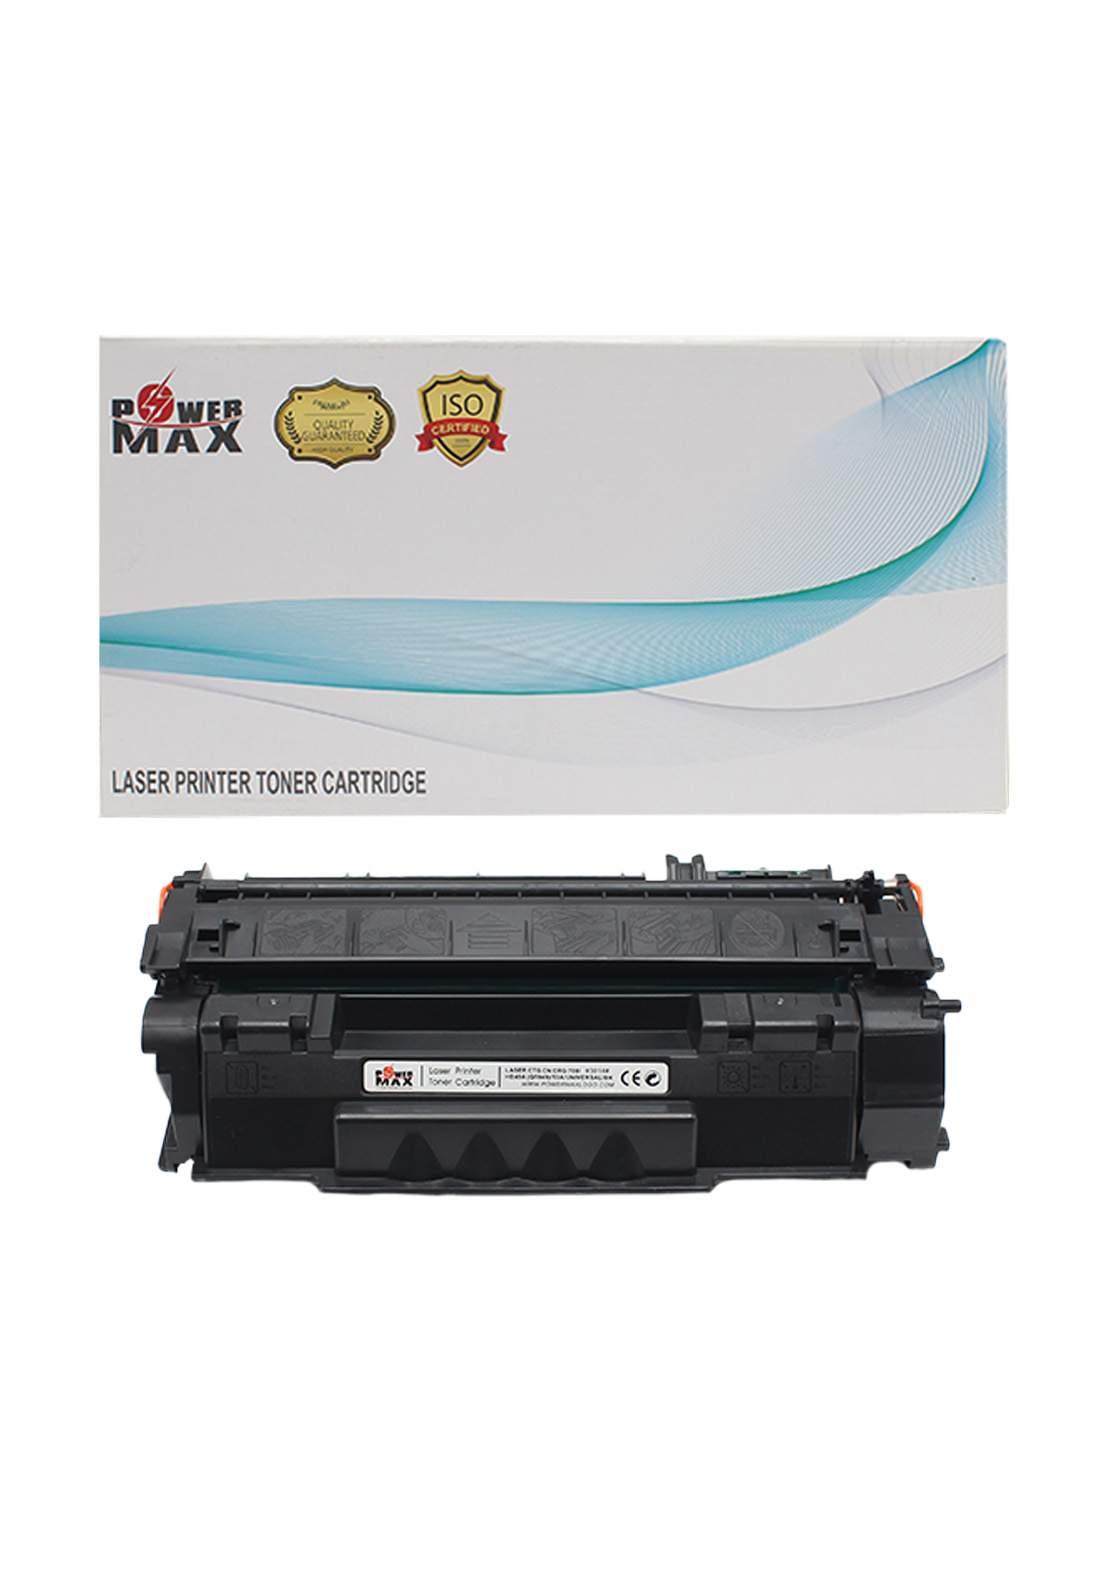 Power Max CTG Canon CRG 708/HP49A (Q5949) /53A Laser Printer Toner Cartridge خرطوشة حبر